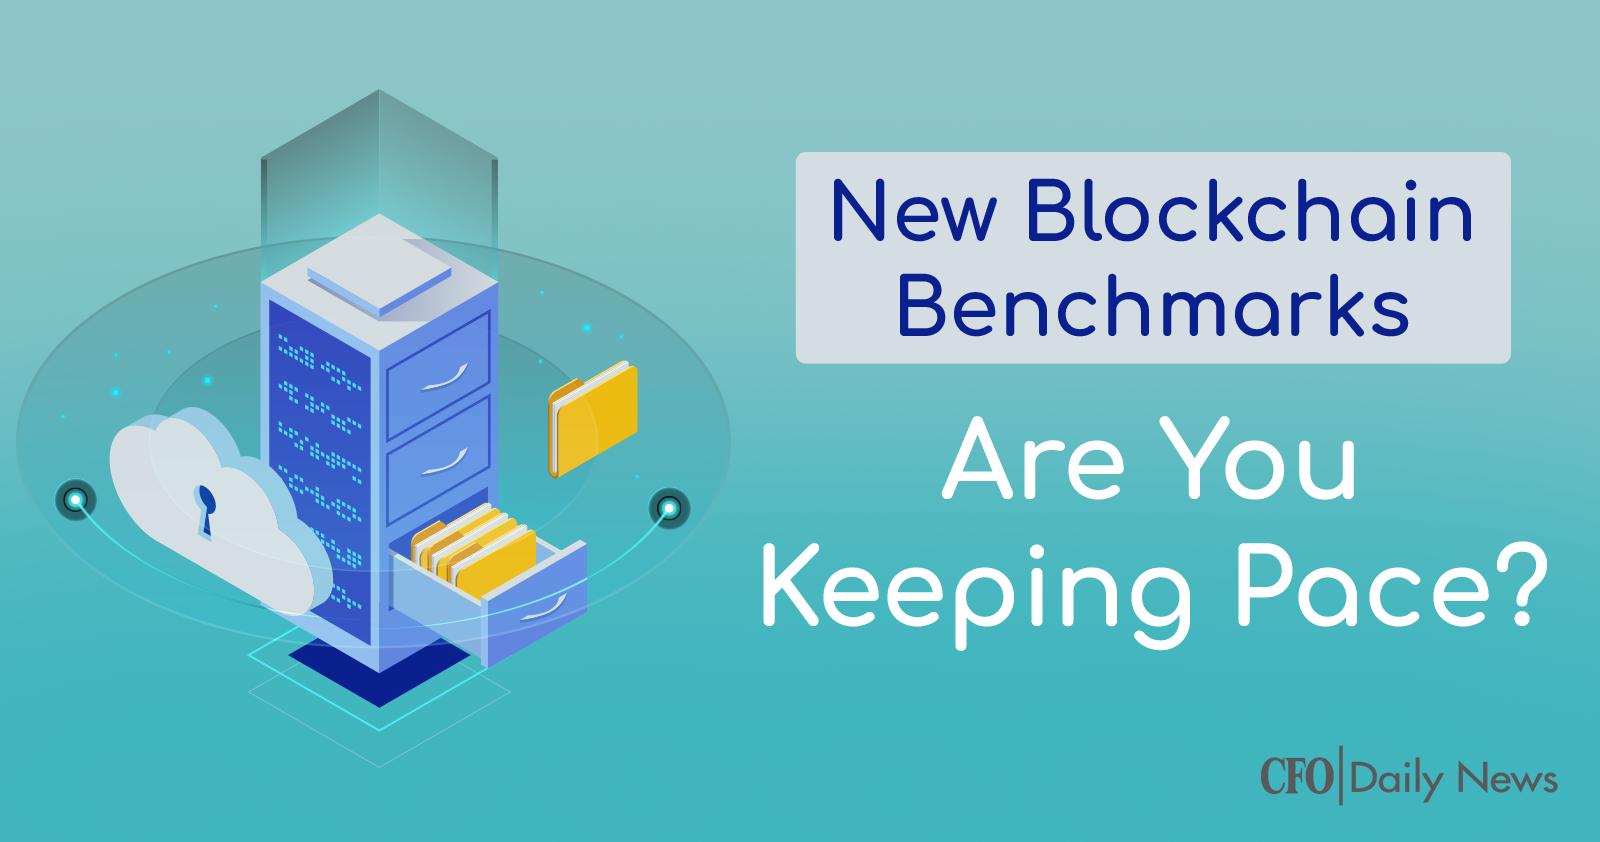 New blockchain benchmarks